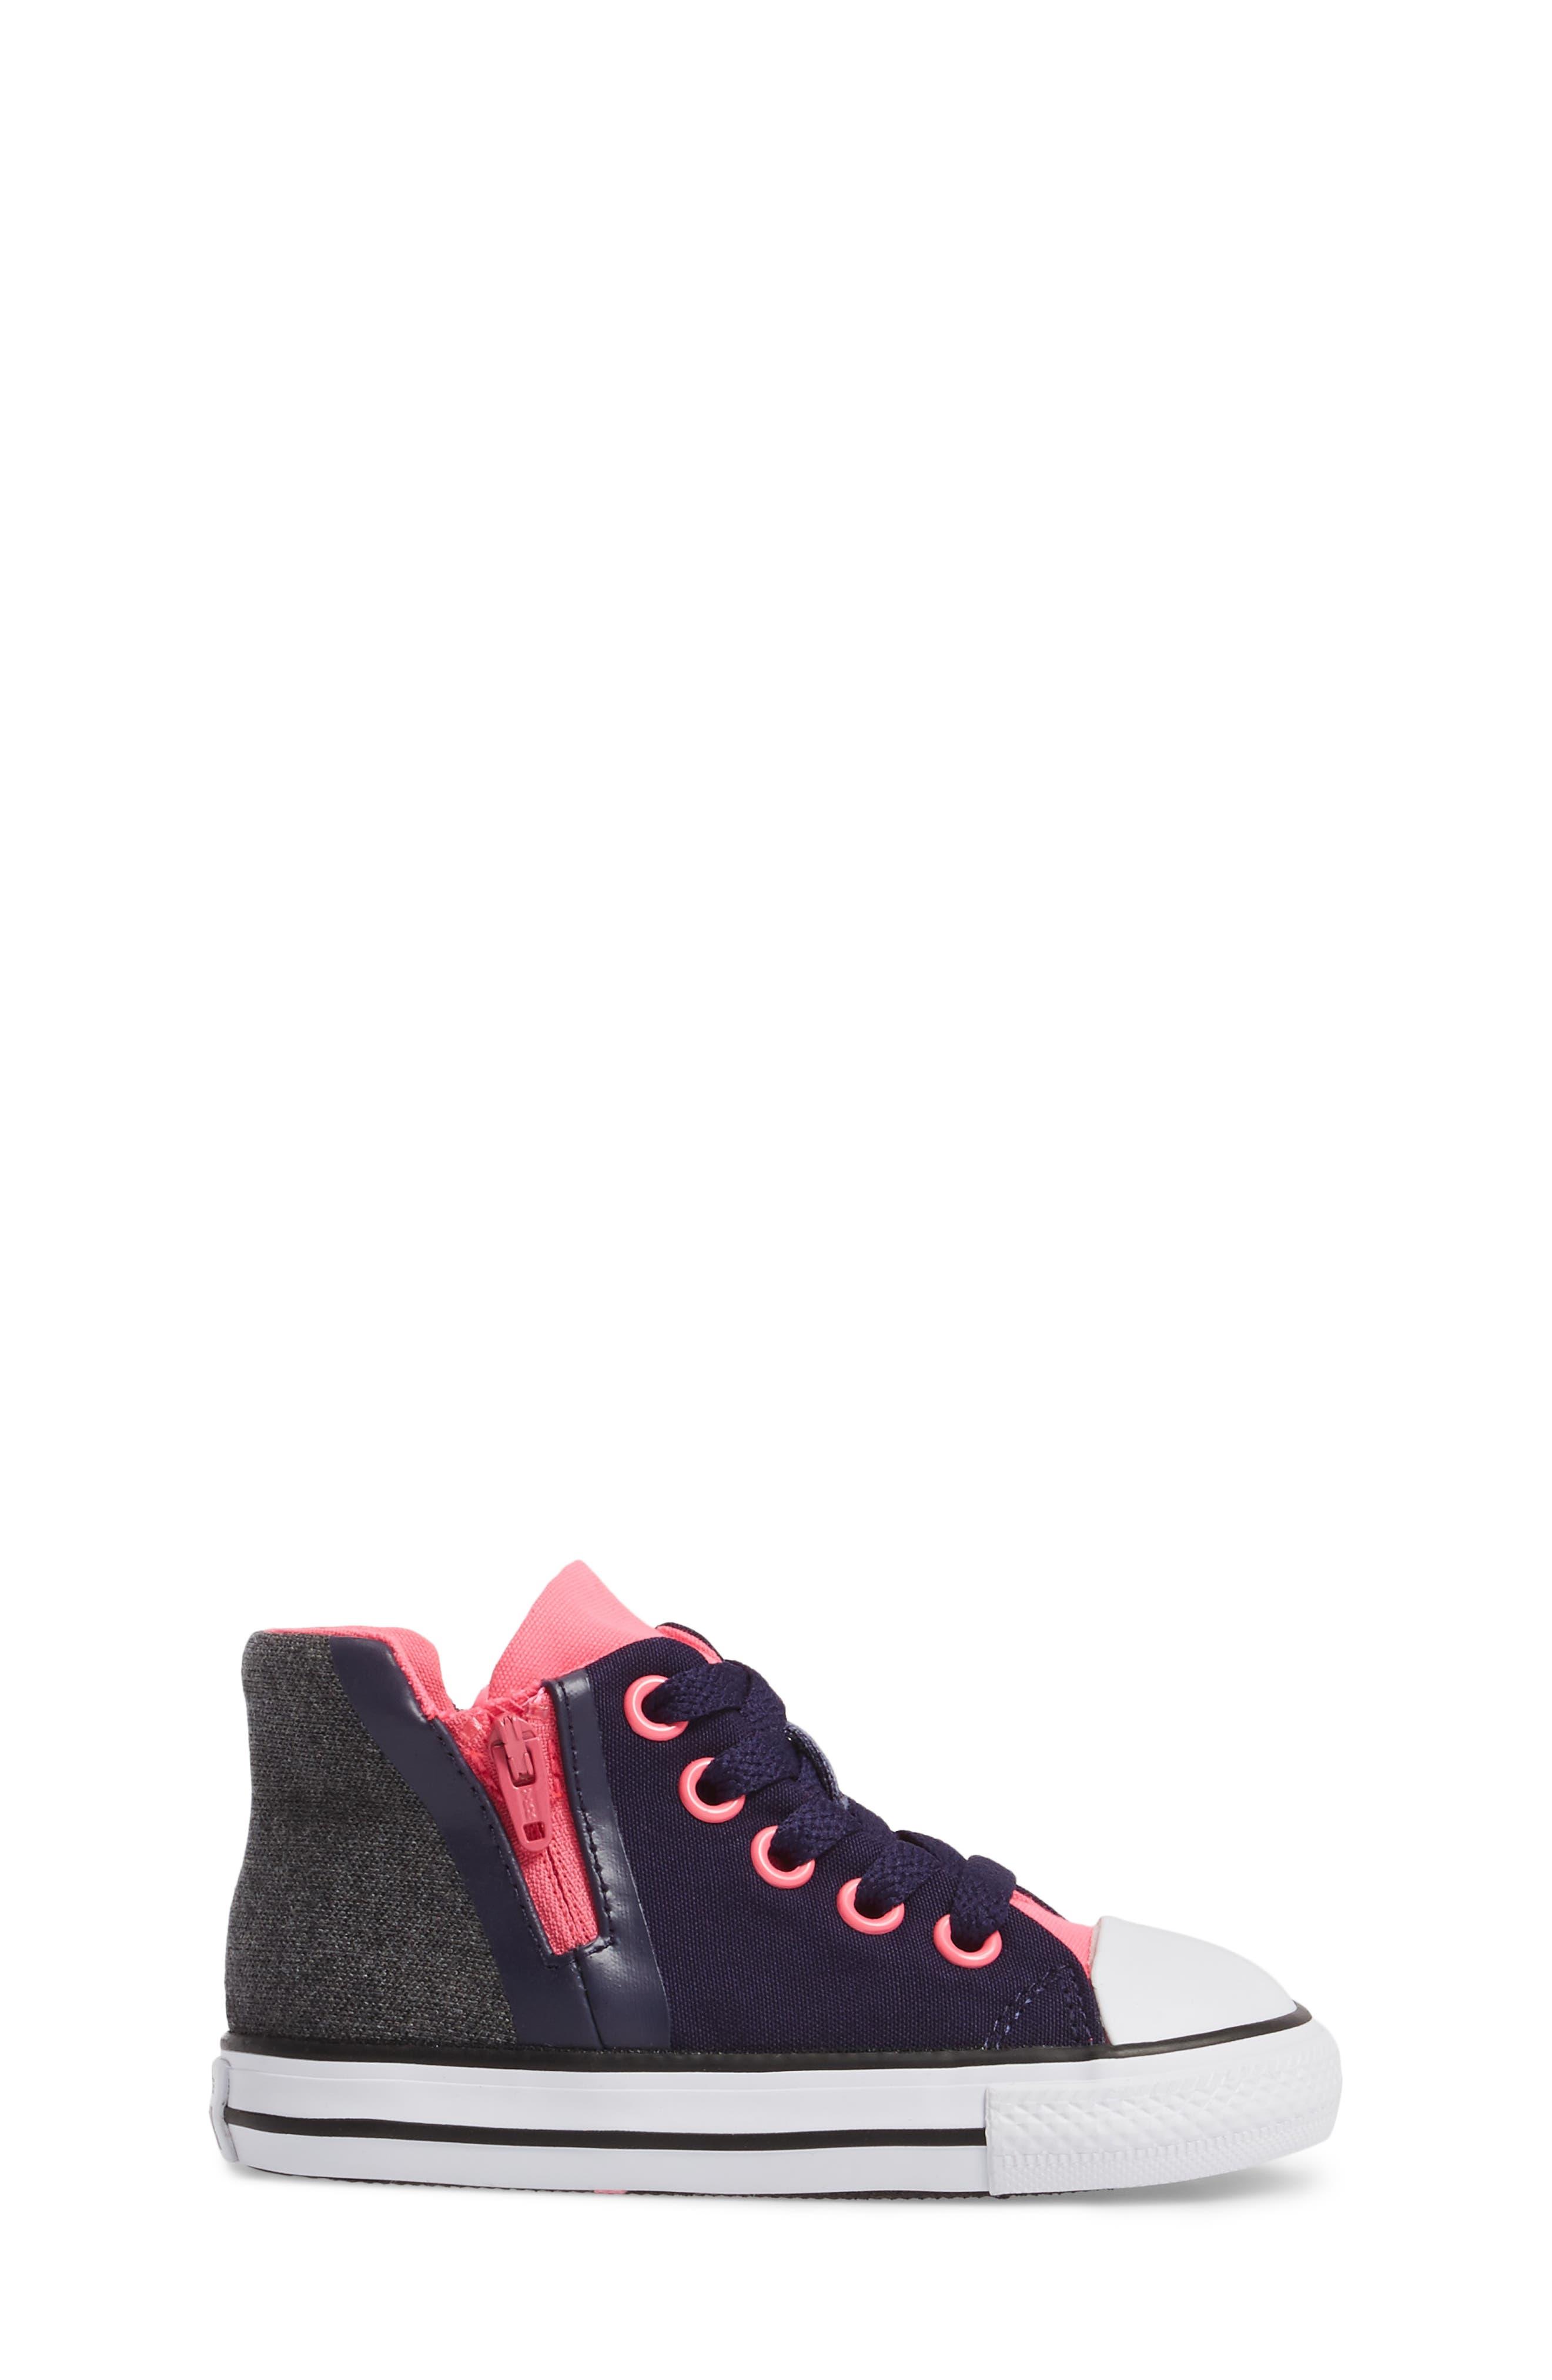 Alternate Image 3  - Converse Chuck Taylor® All Star® Sport Zip High Top Sneaker (Baby, Walker, Toddler, Little Kid & Big Kid)